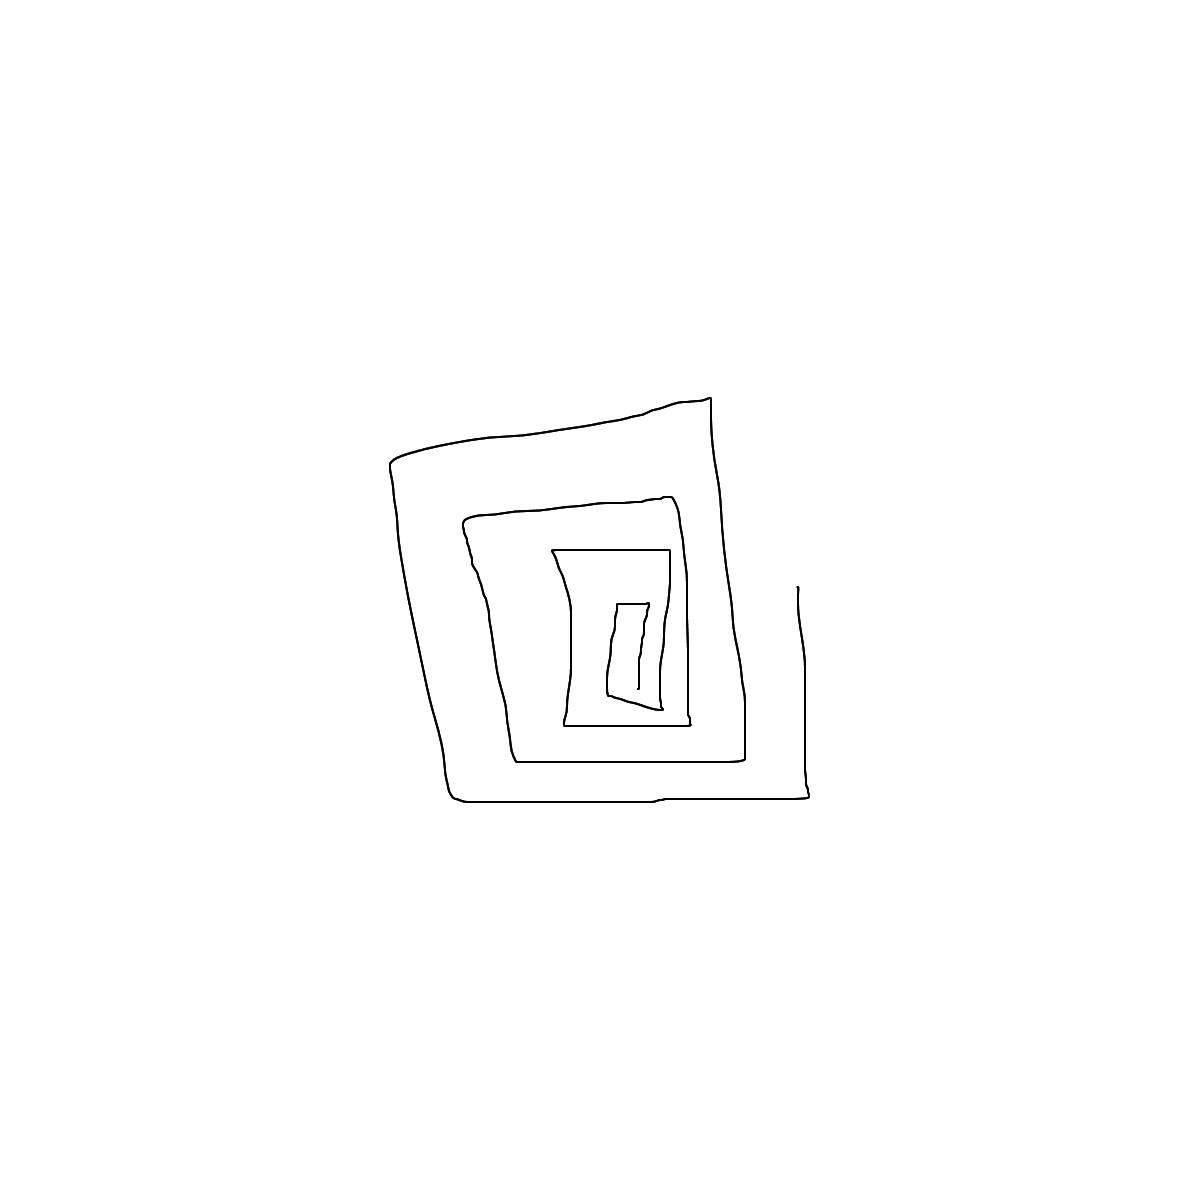 BAAAM drawing#481 lat:-35.2039985656738300lng: 173.9336395263672000